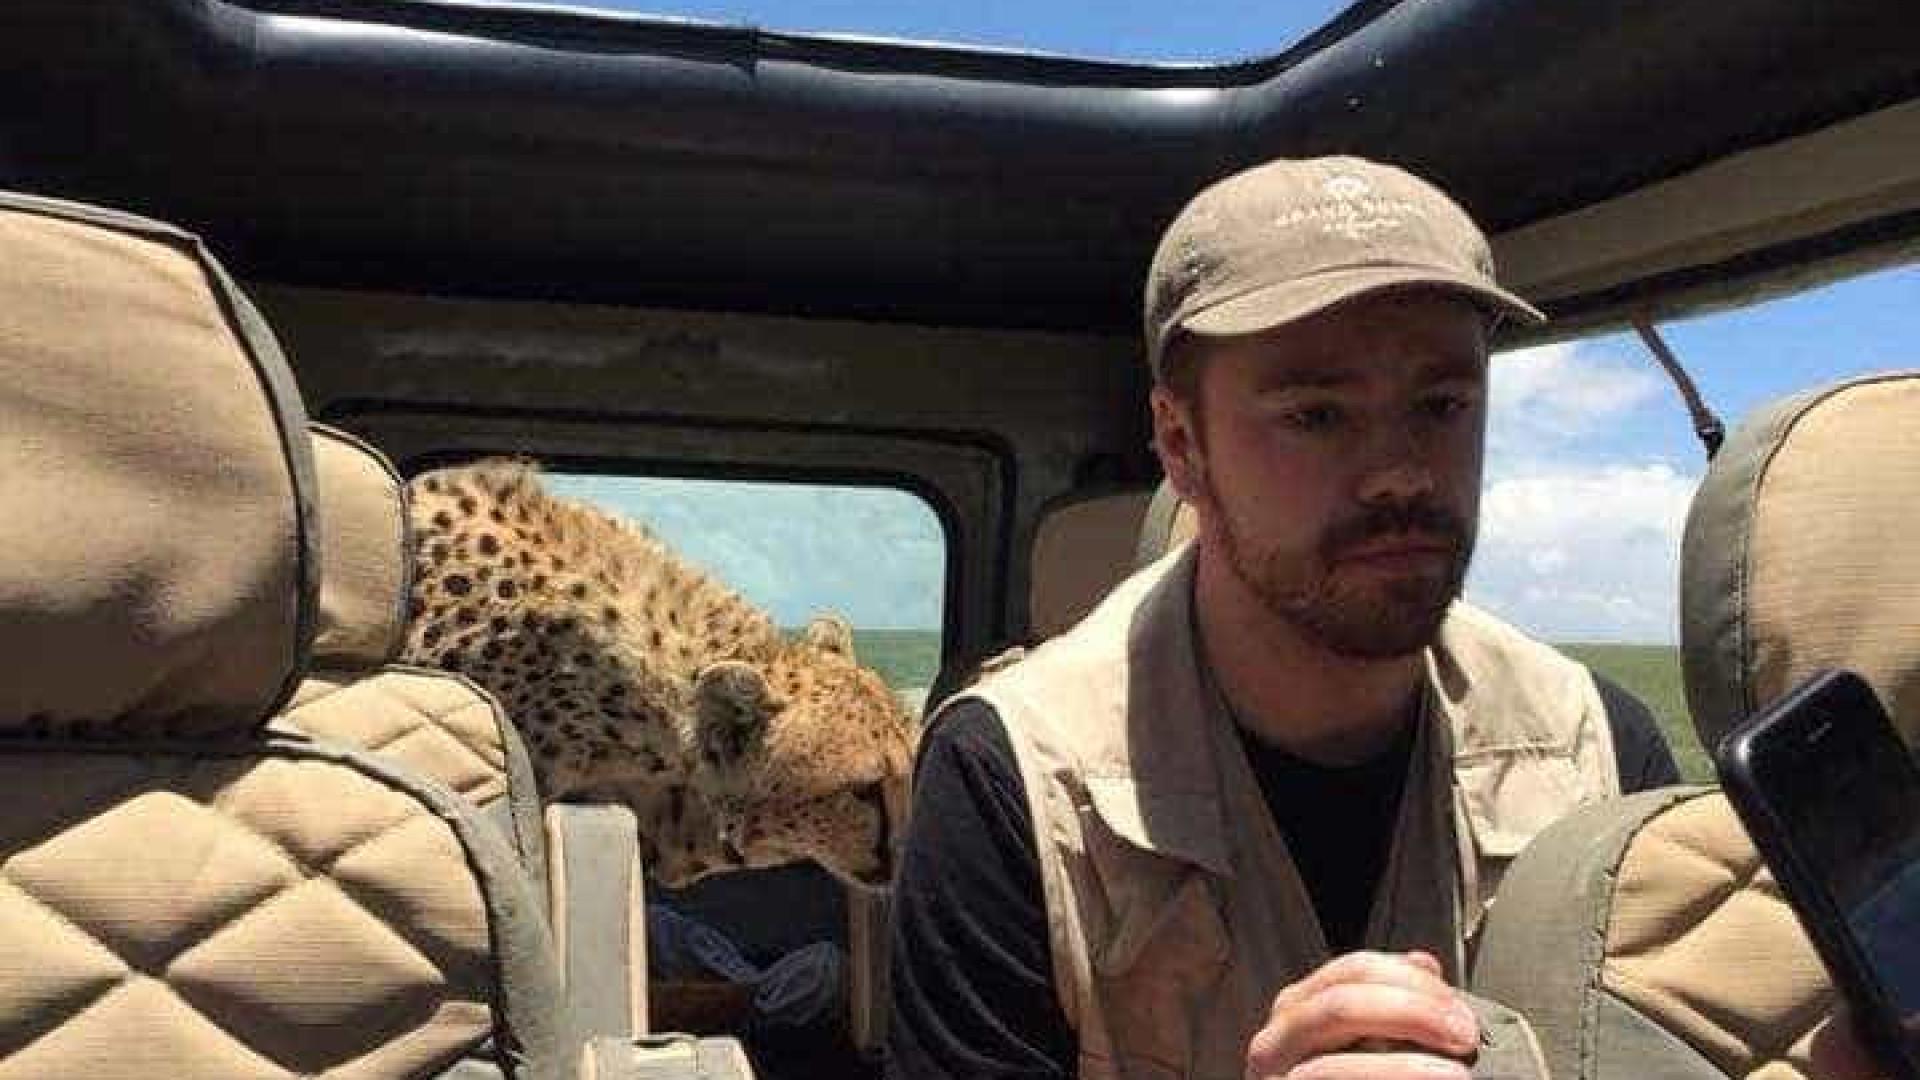 Guepardo invade jipe de turista durante safari na Tanzânia; veja vídeo